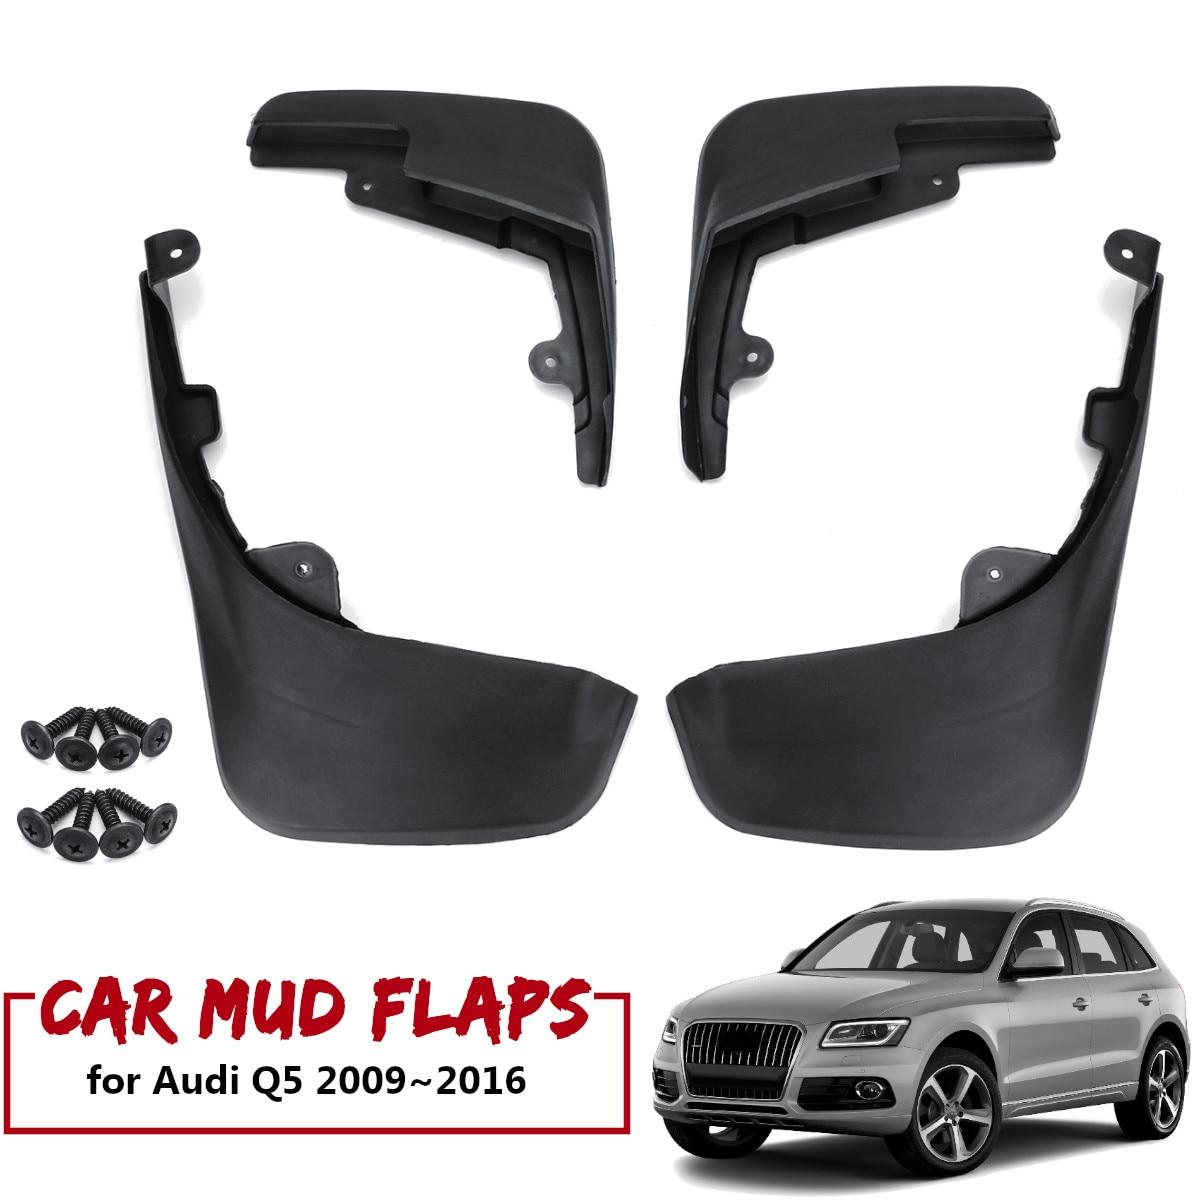 Mud Flaps For Audi Q5 2009~2016 2012 Mudflaps Splash Guards Mudguards Front Rear